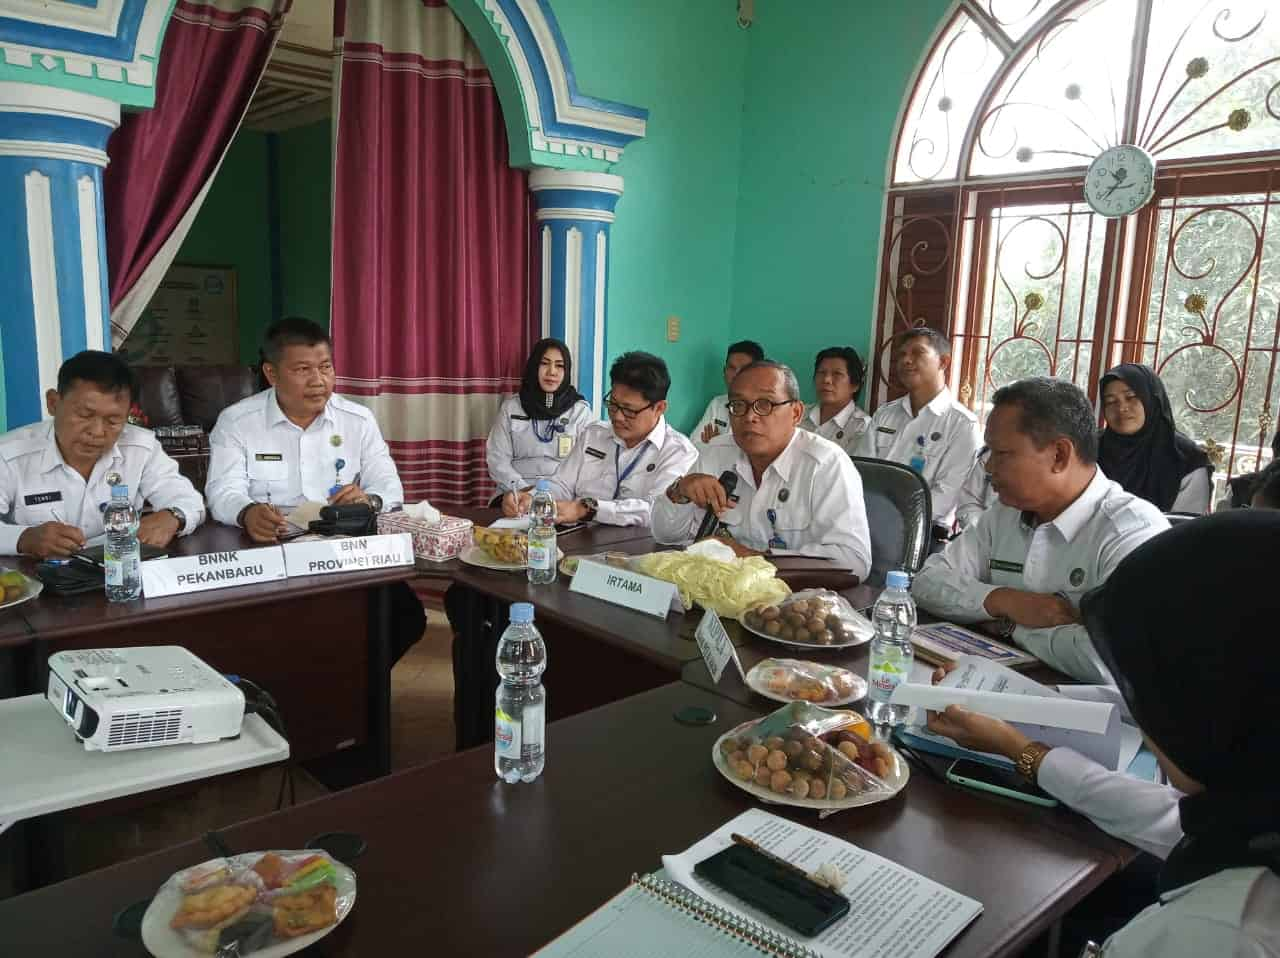 Taklimat Awal Audit Ittama di Wilayah Provinsi Riau